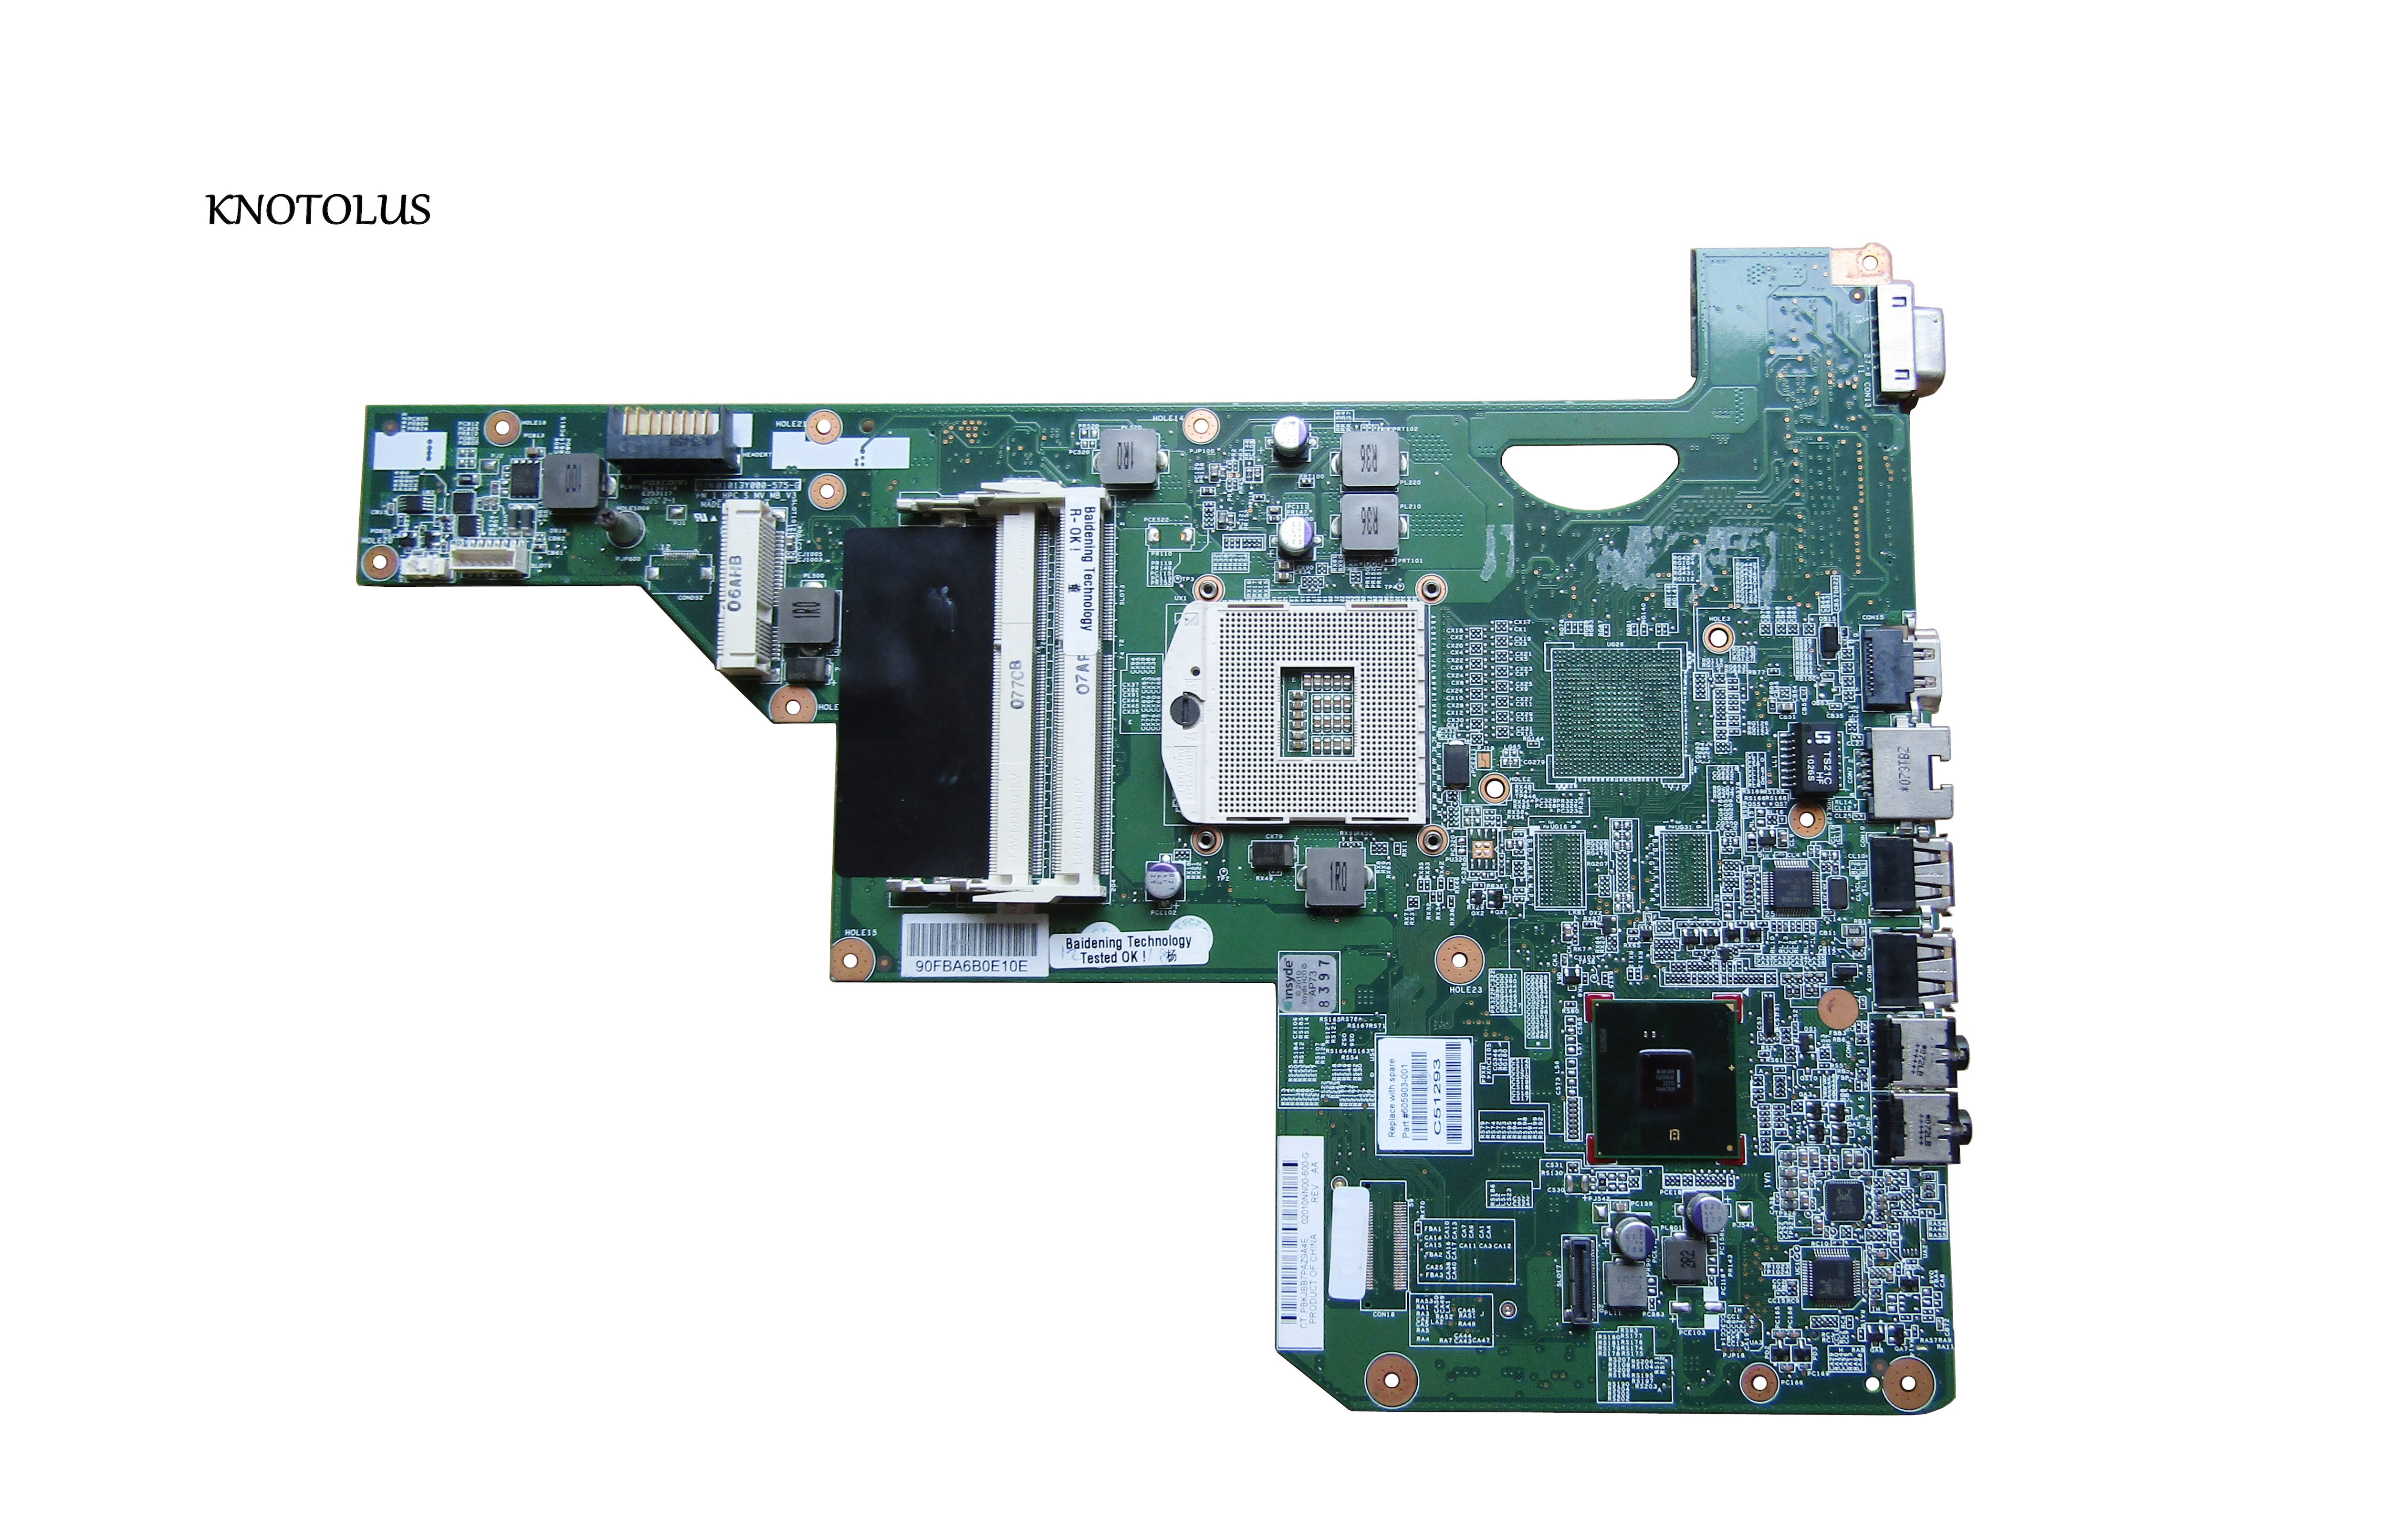 Hulics המקורי 605903-001 לוח עבור HP G62 G72 האם מחשב נייד עם hm55 chipset